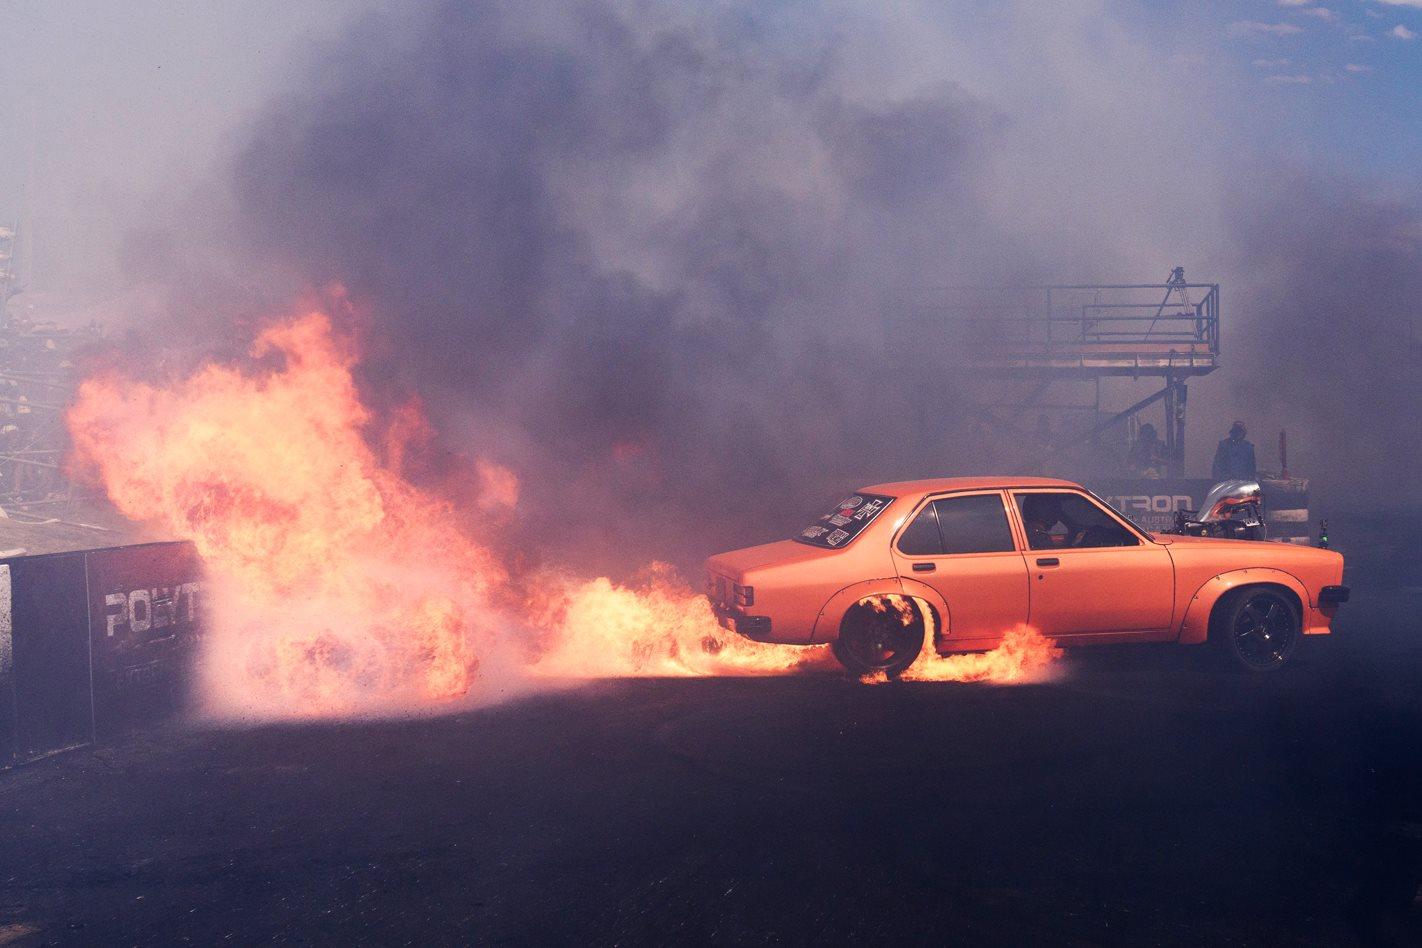 Best Value Auto >> PEPER IT TORANA – MASSIVE BURNOUT FIRE AT SUMMERNATS 31